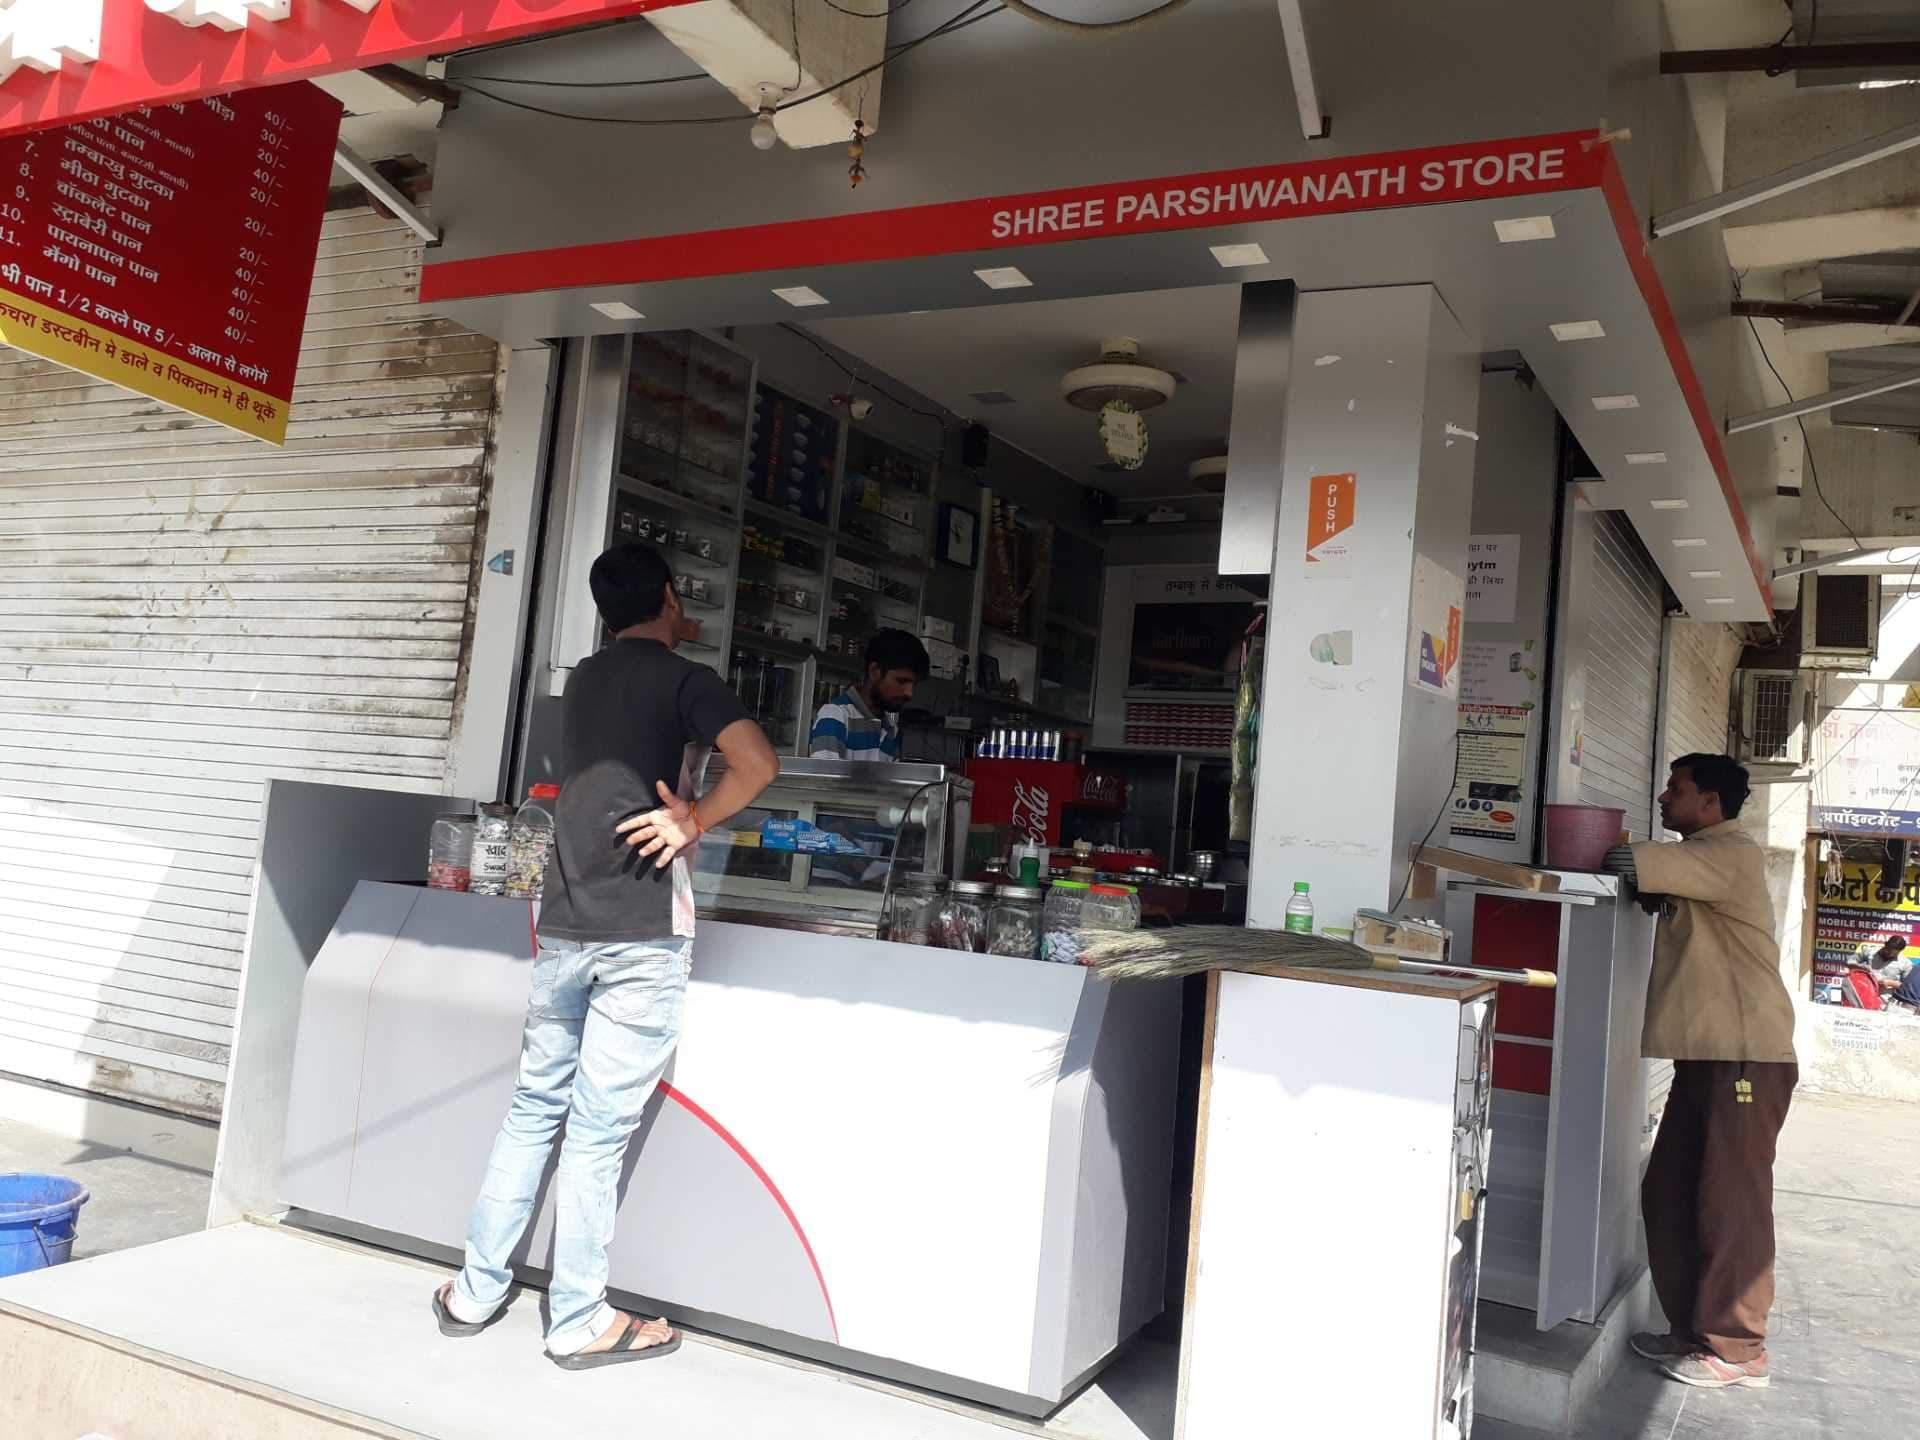 Top 30 Marlboro Cigarette Retailers in Indore - Best Marlboro